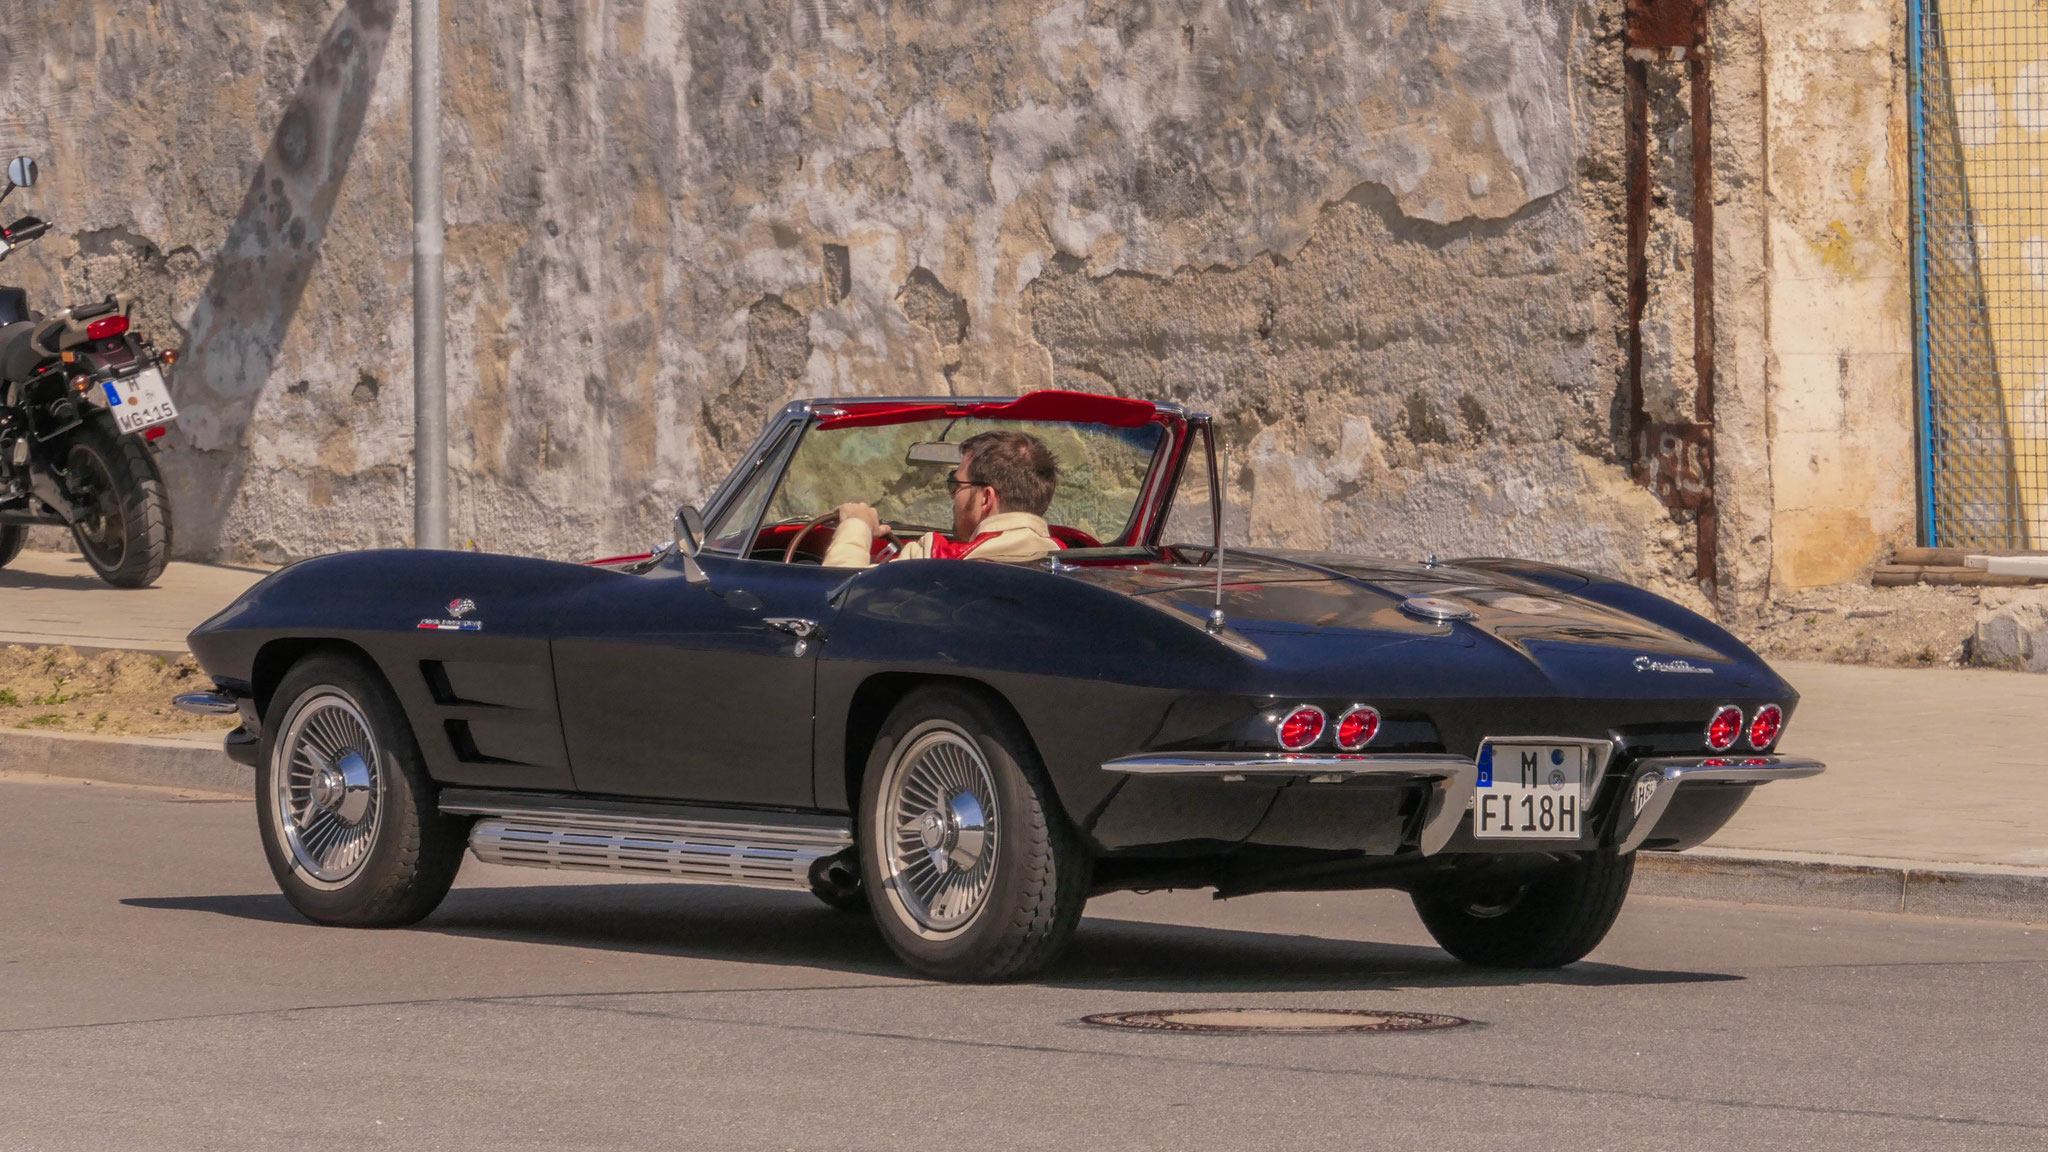 Chevrolet Corvette C2 - M-FI-18H